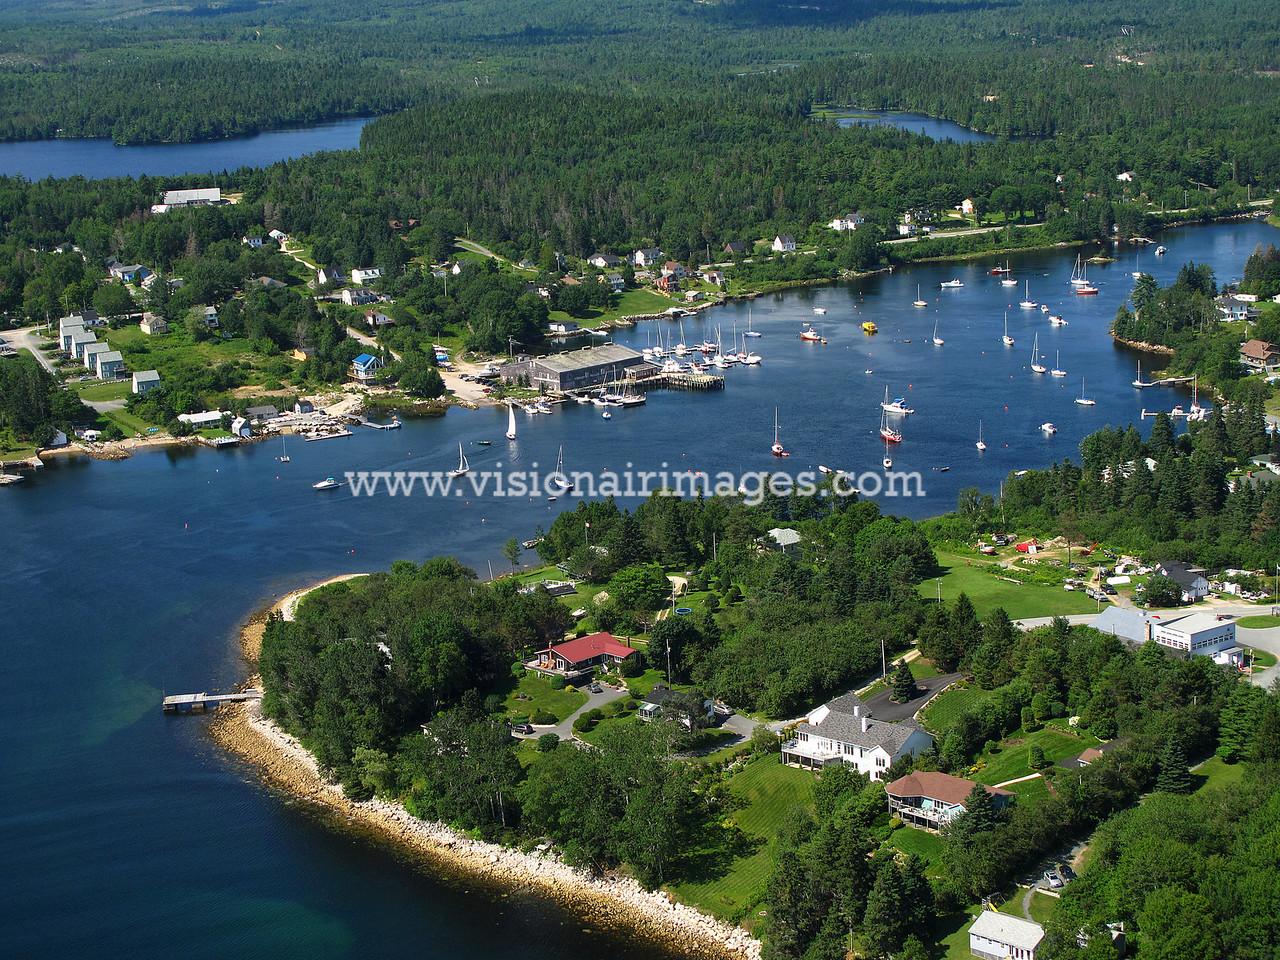 Hubbards, Coastal Living, Hubbards, Lighthouse Route, Shore Club, Hubbards Yacht Club, Nova Scotia, Canada